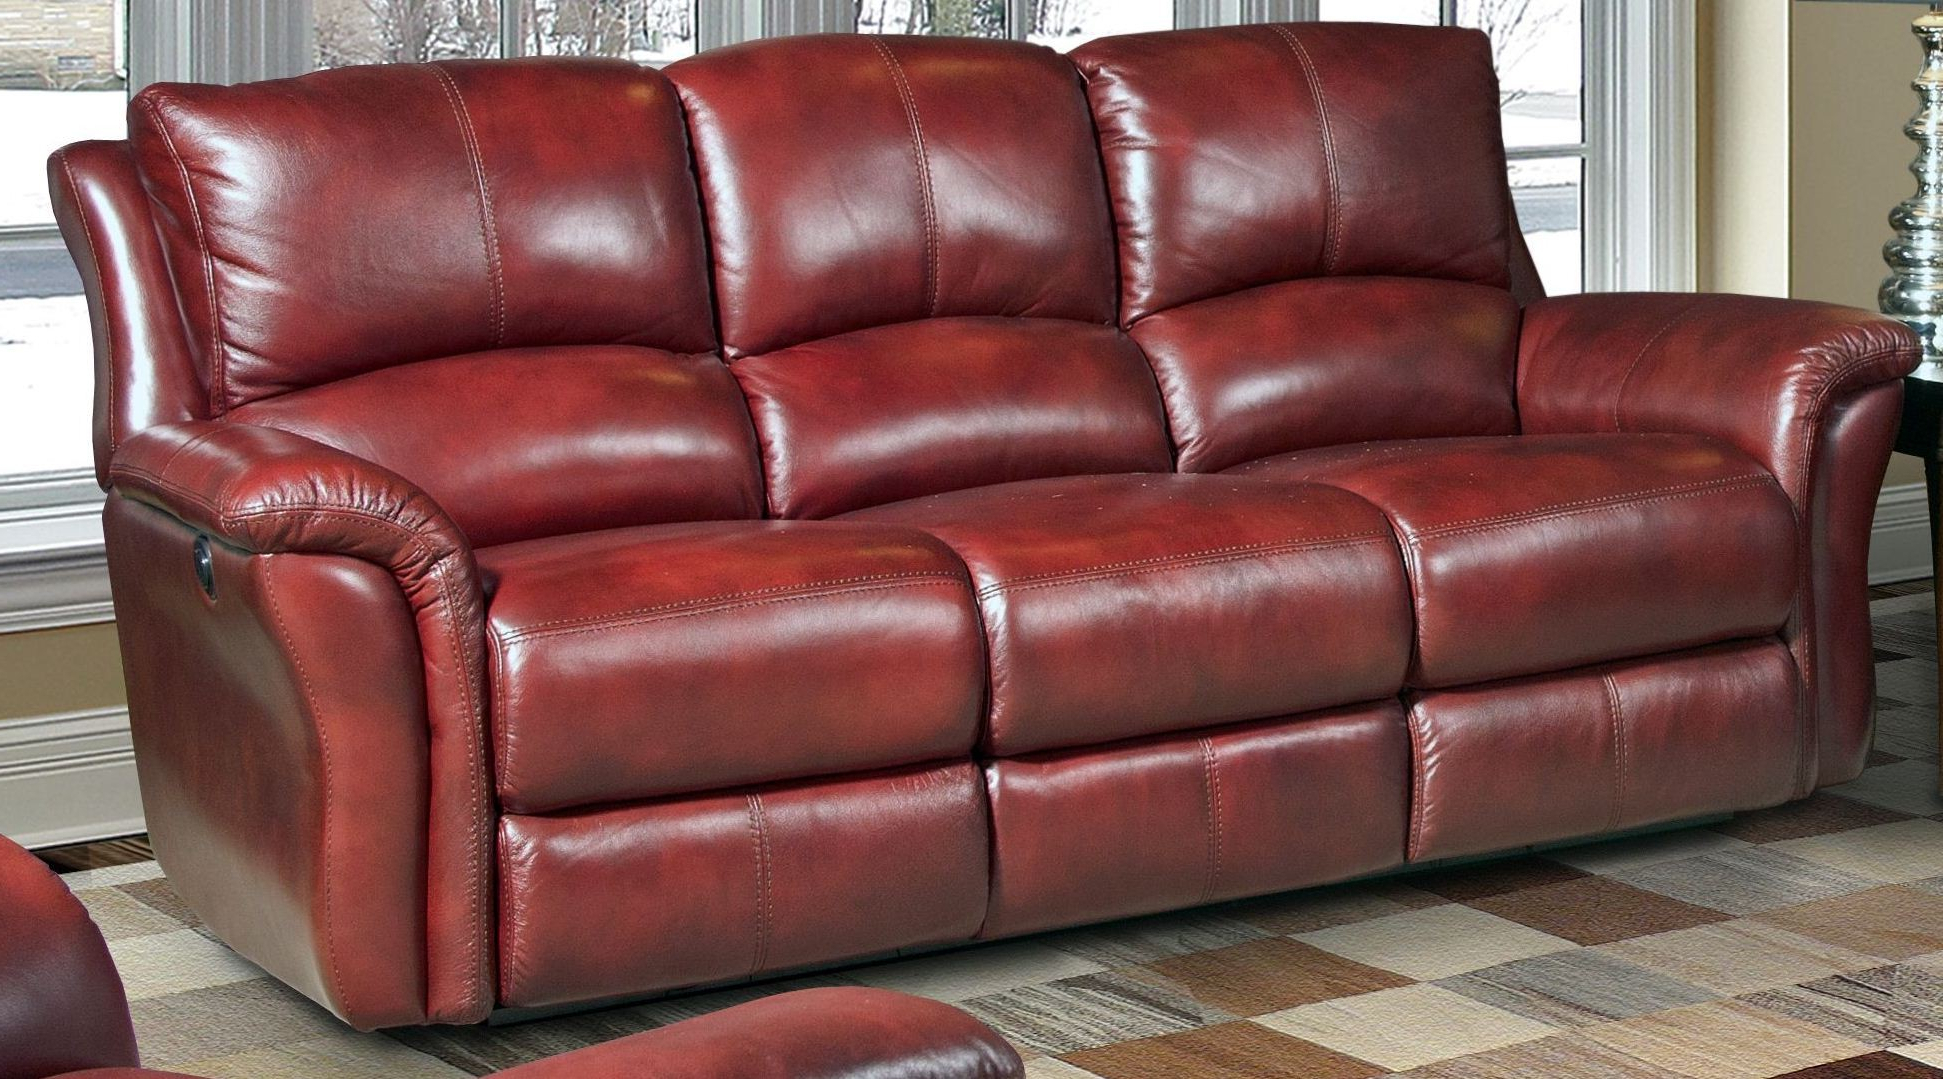 Dual Power Reclining Sofas Regarding Fashionable Lewis Lipstick Dual Power Reclining Sofa From Parker (View 5 of 20)